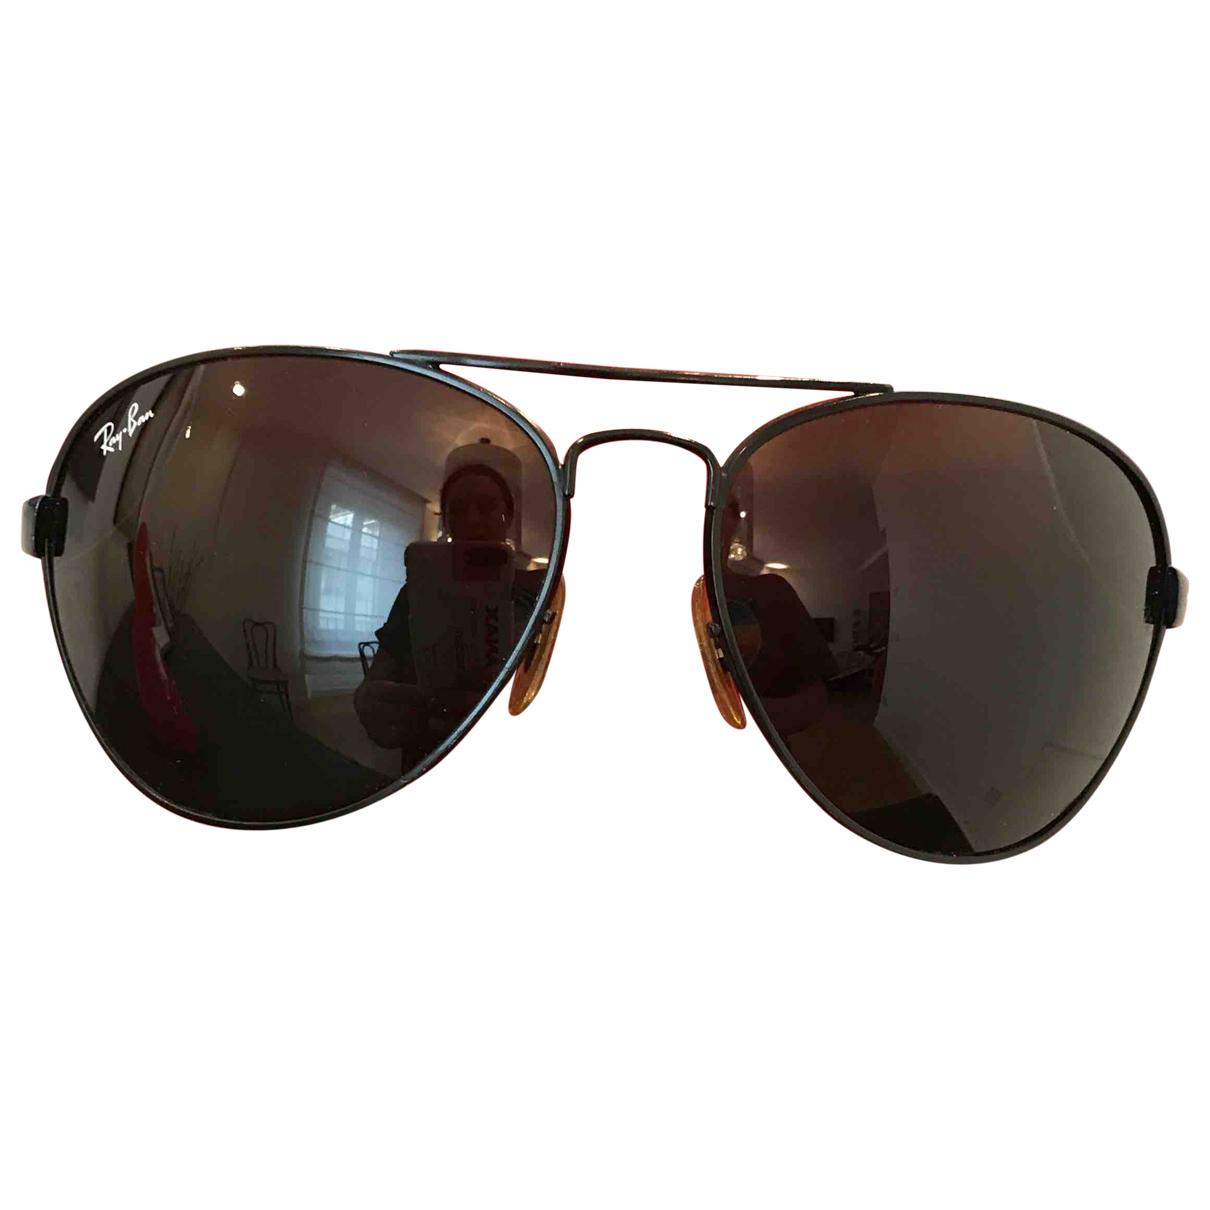 Ray-ban Aviator Black Metal Sunglasses for Women N